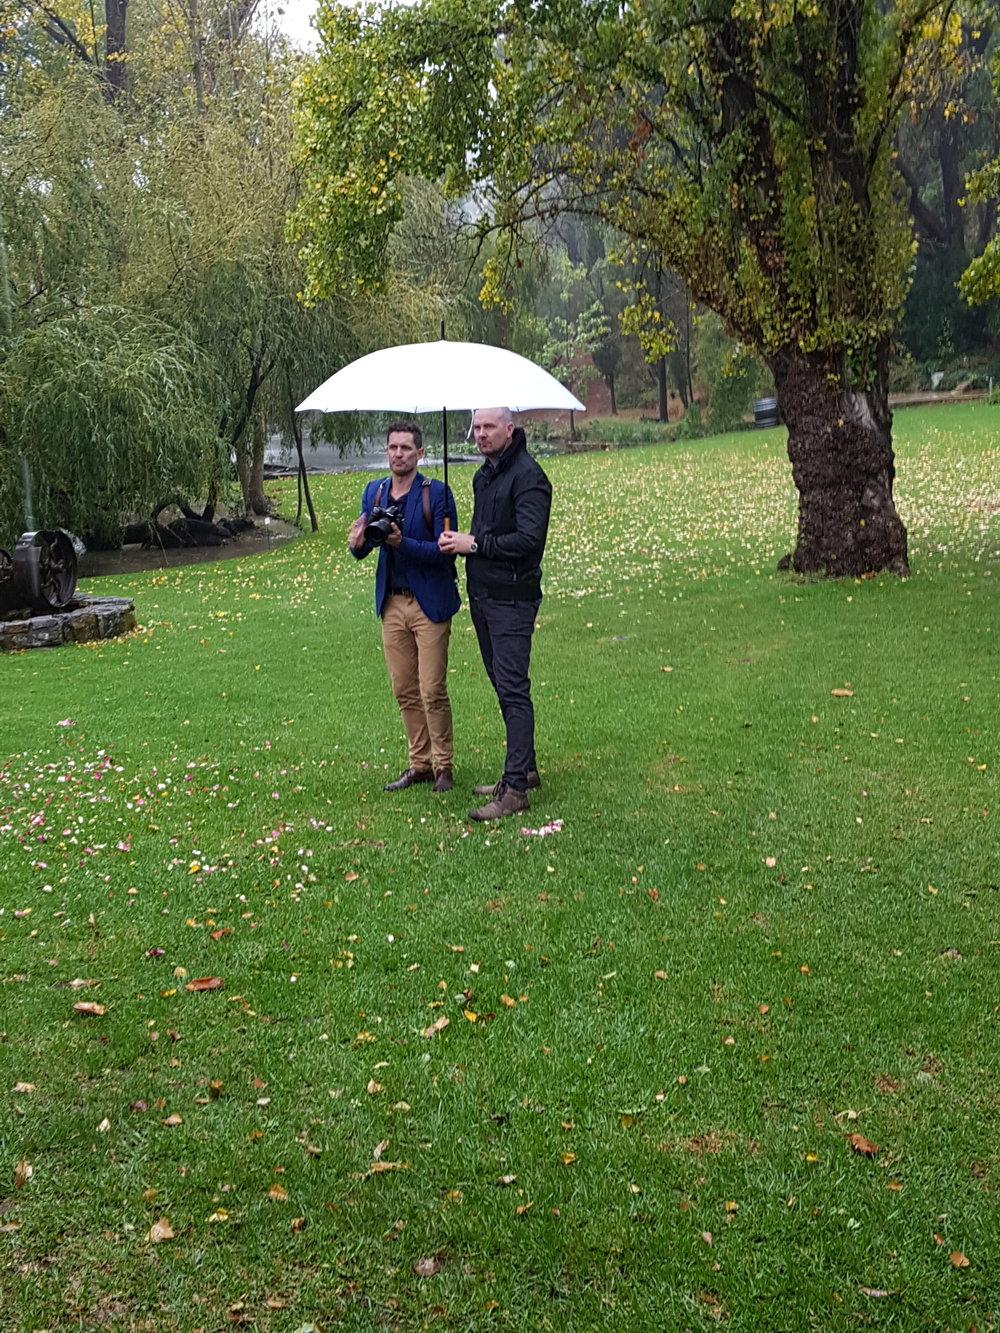 Mark Dohring's exceptional umbrella holding skills on display